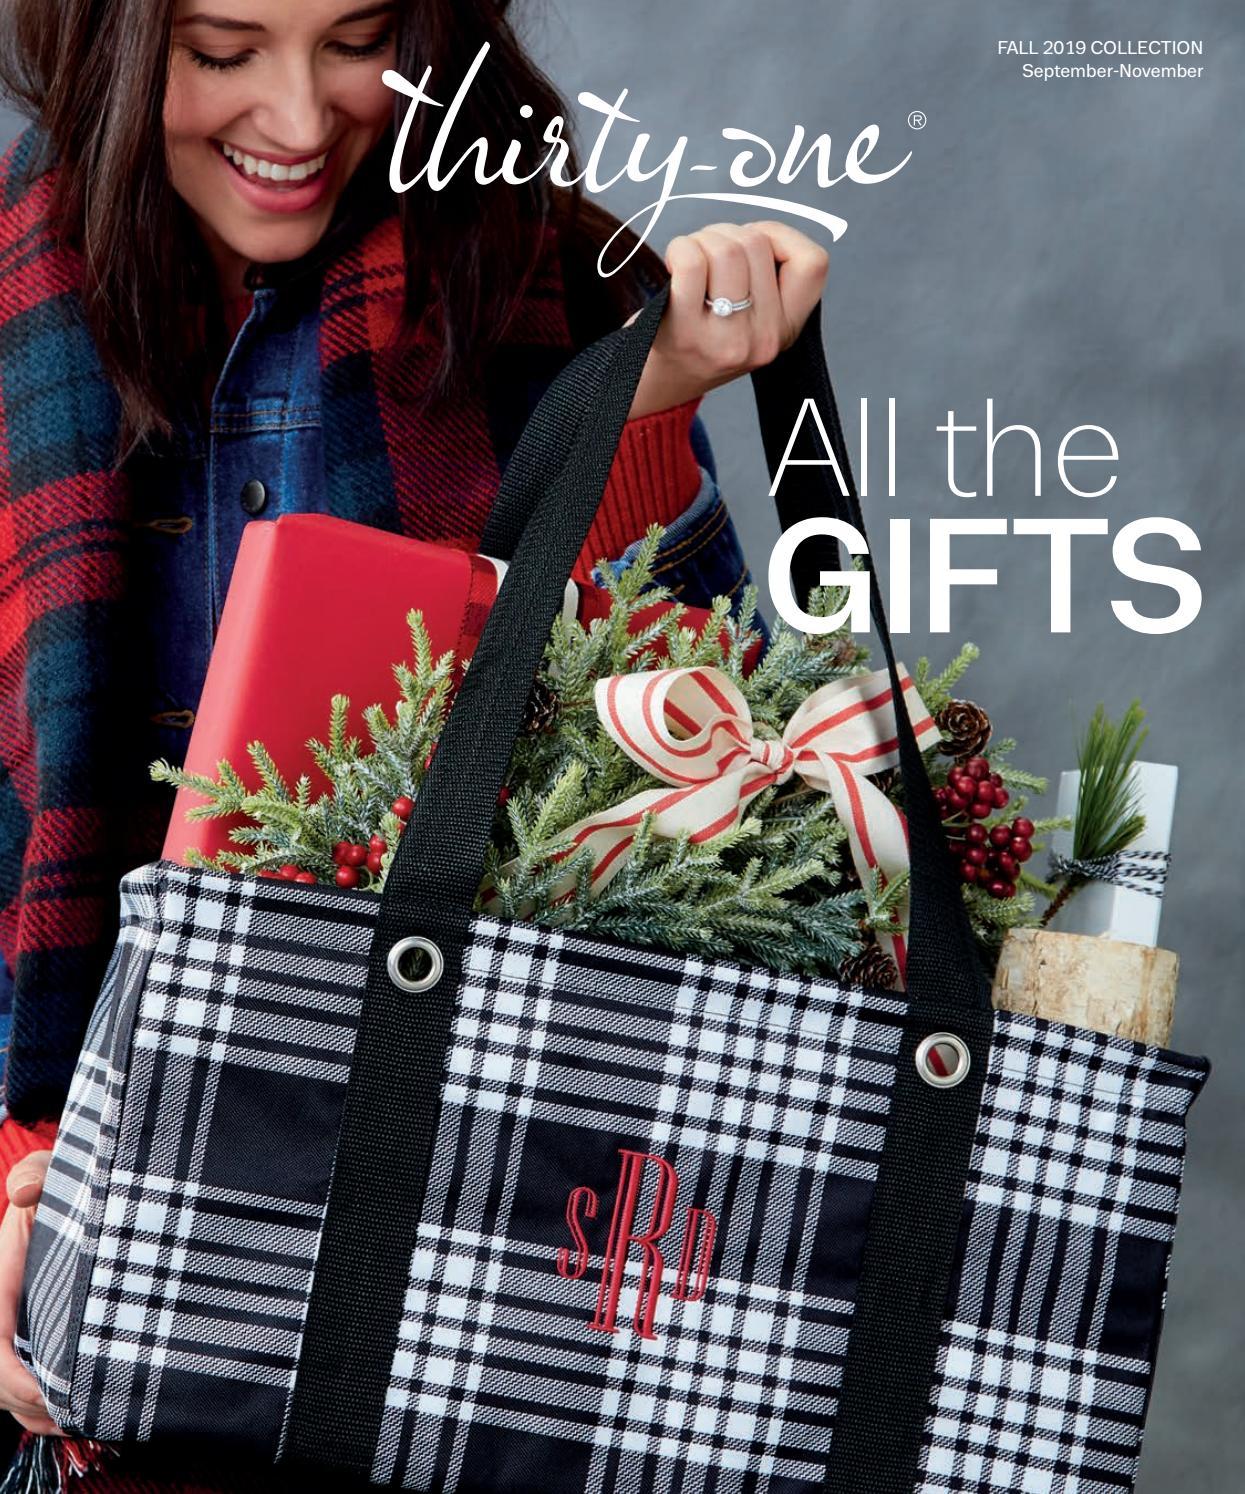 iThirtyi iOnei Gifts iFalli iWinteri Catalog 2020 i2020i by Suzanne